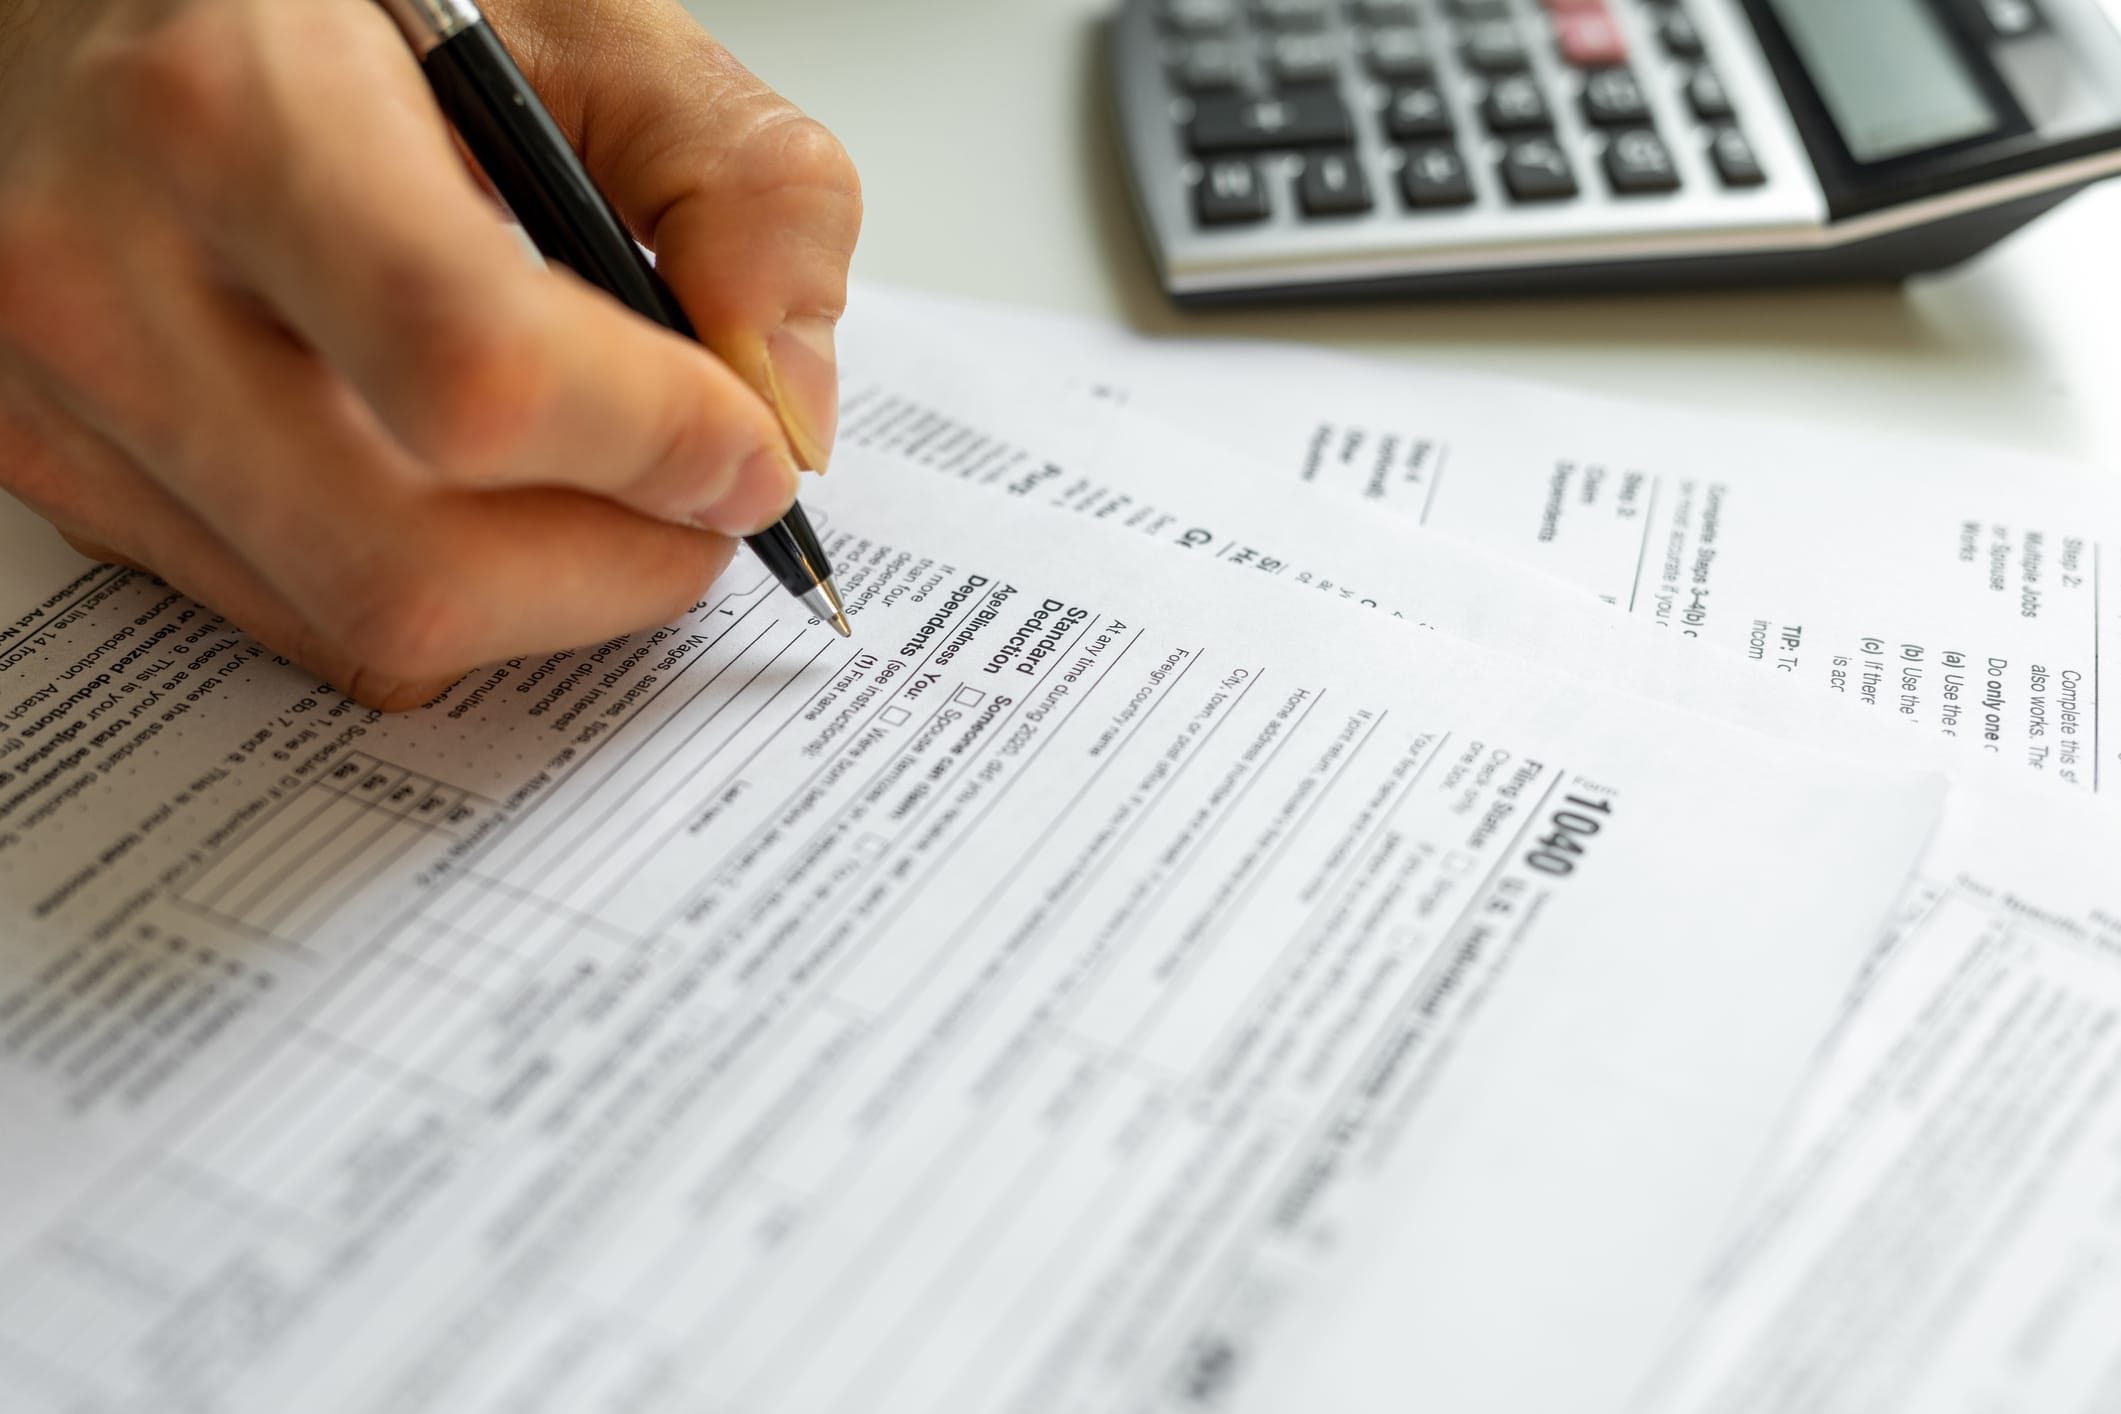 Pengembalian pajak 2020 dapat diatribusikan ke IRS pada Mampu hanya 17. Di bawah ini ialah beberapa petunjuk pengiriman menit terakhir thumbnail